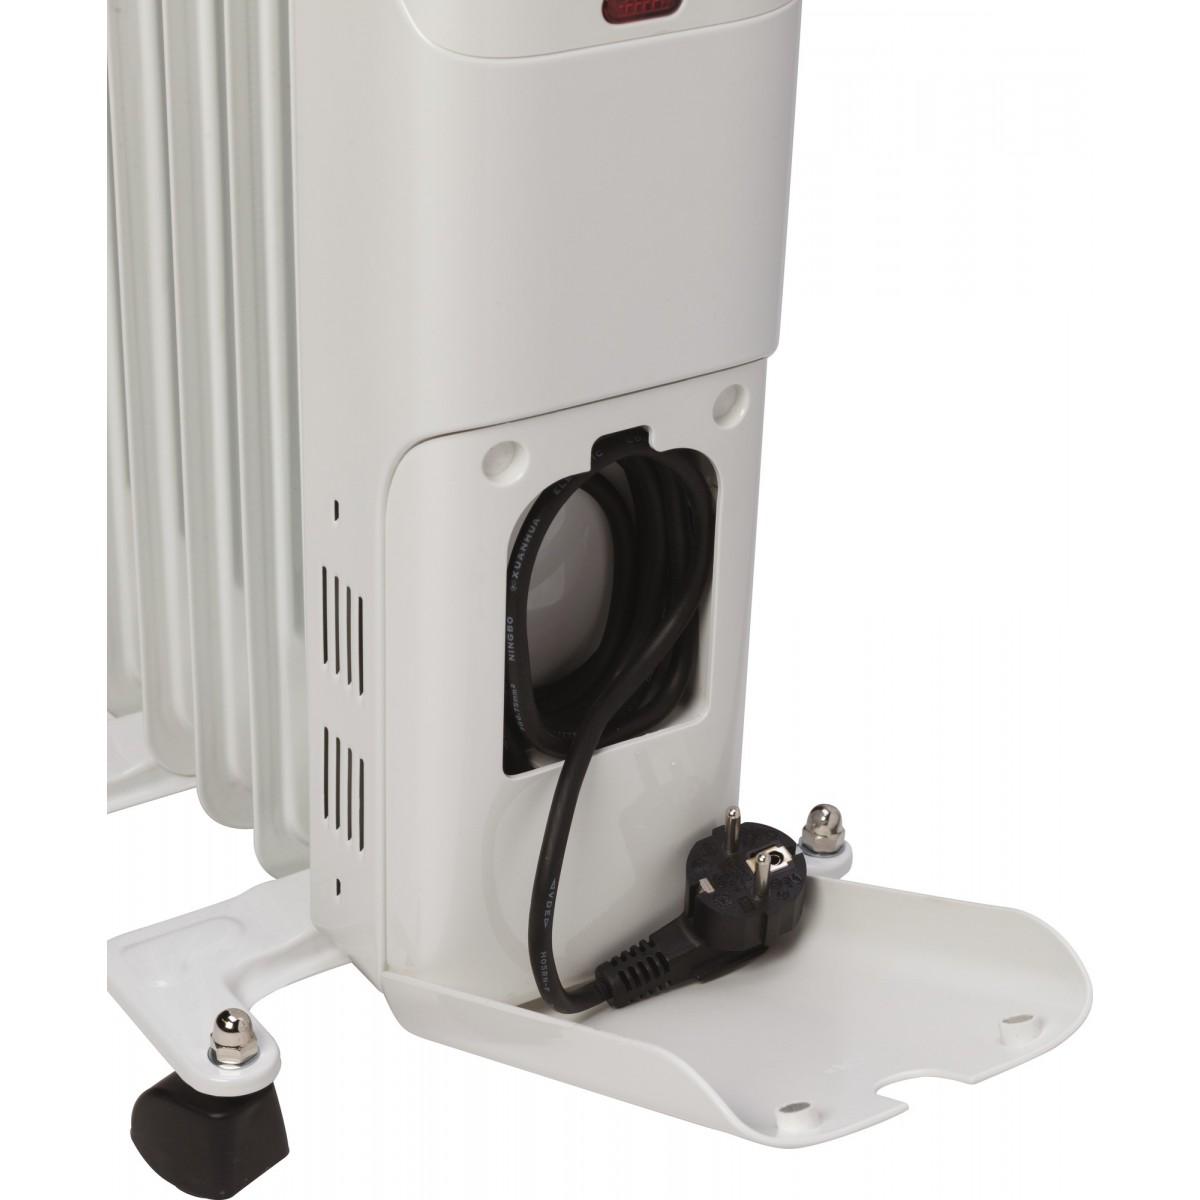 Radiateur bain d'huile Ingarø Varma - 2000 W - Blanc